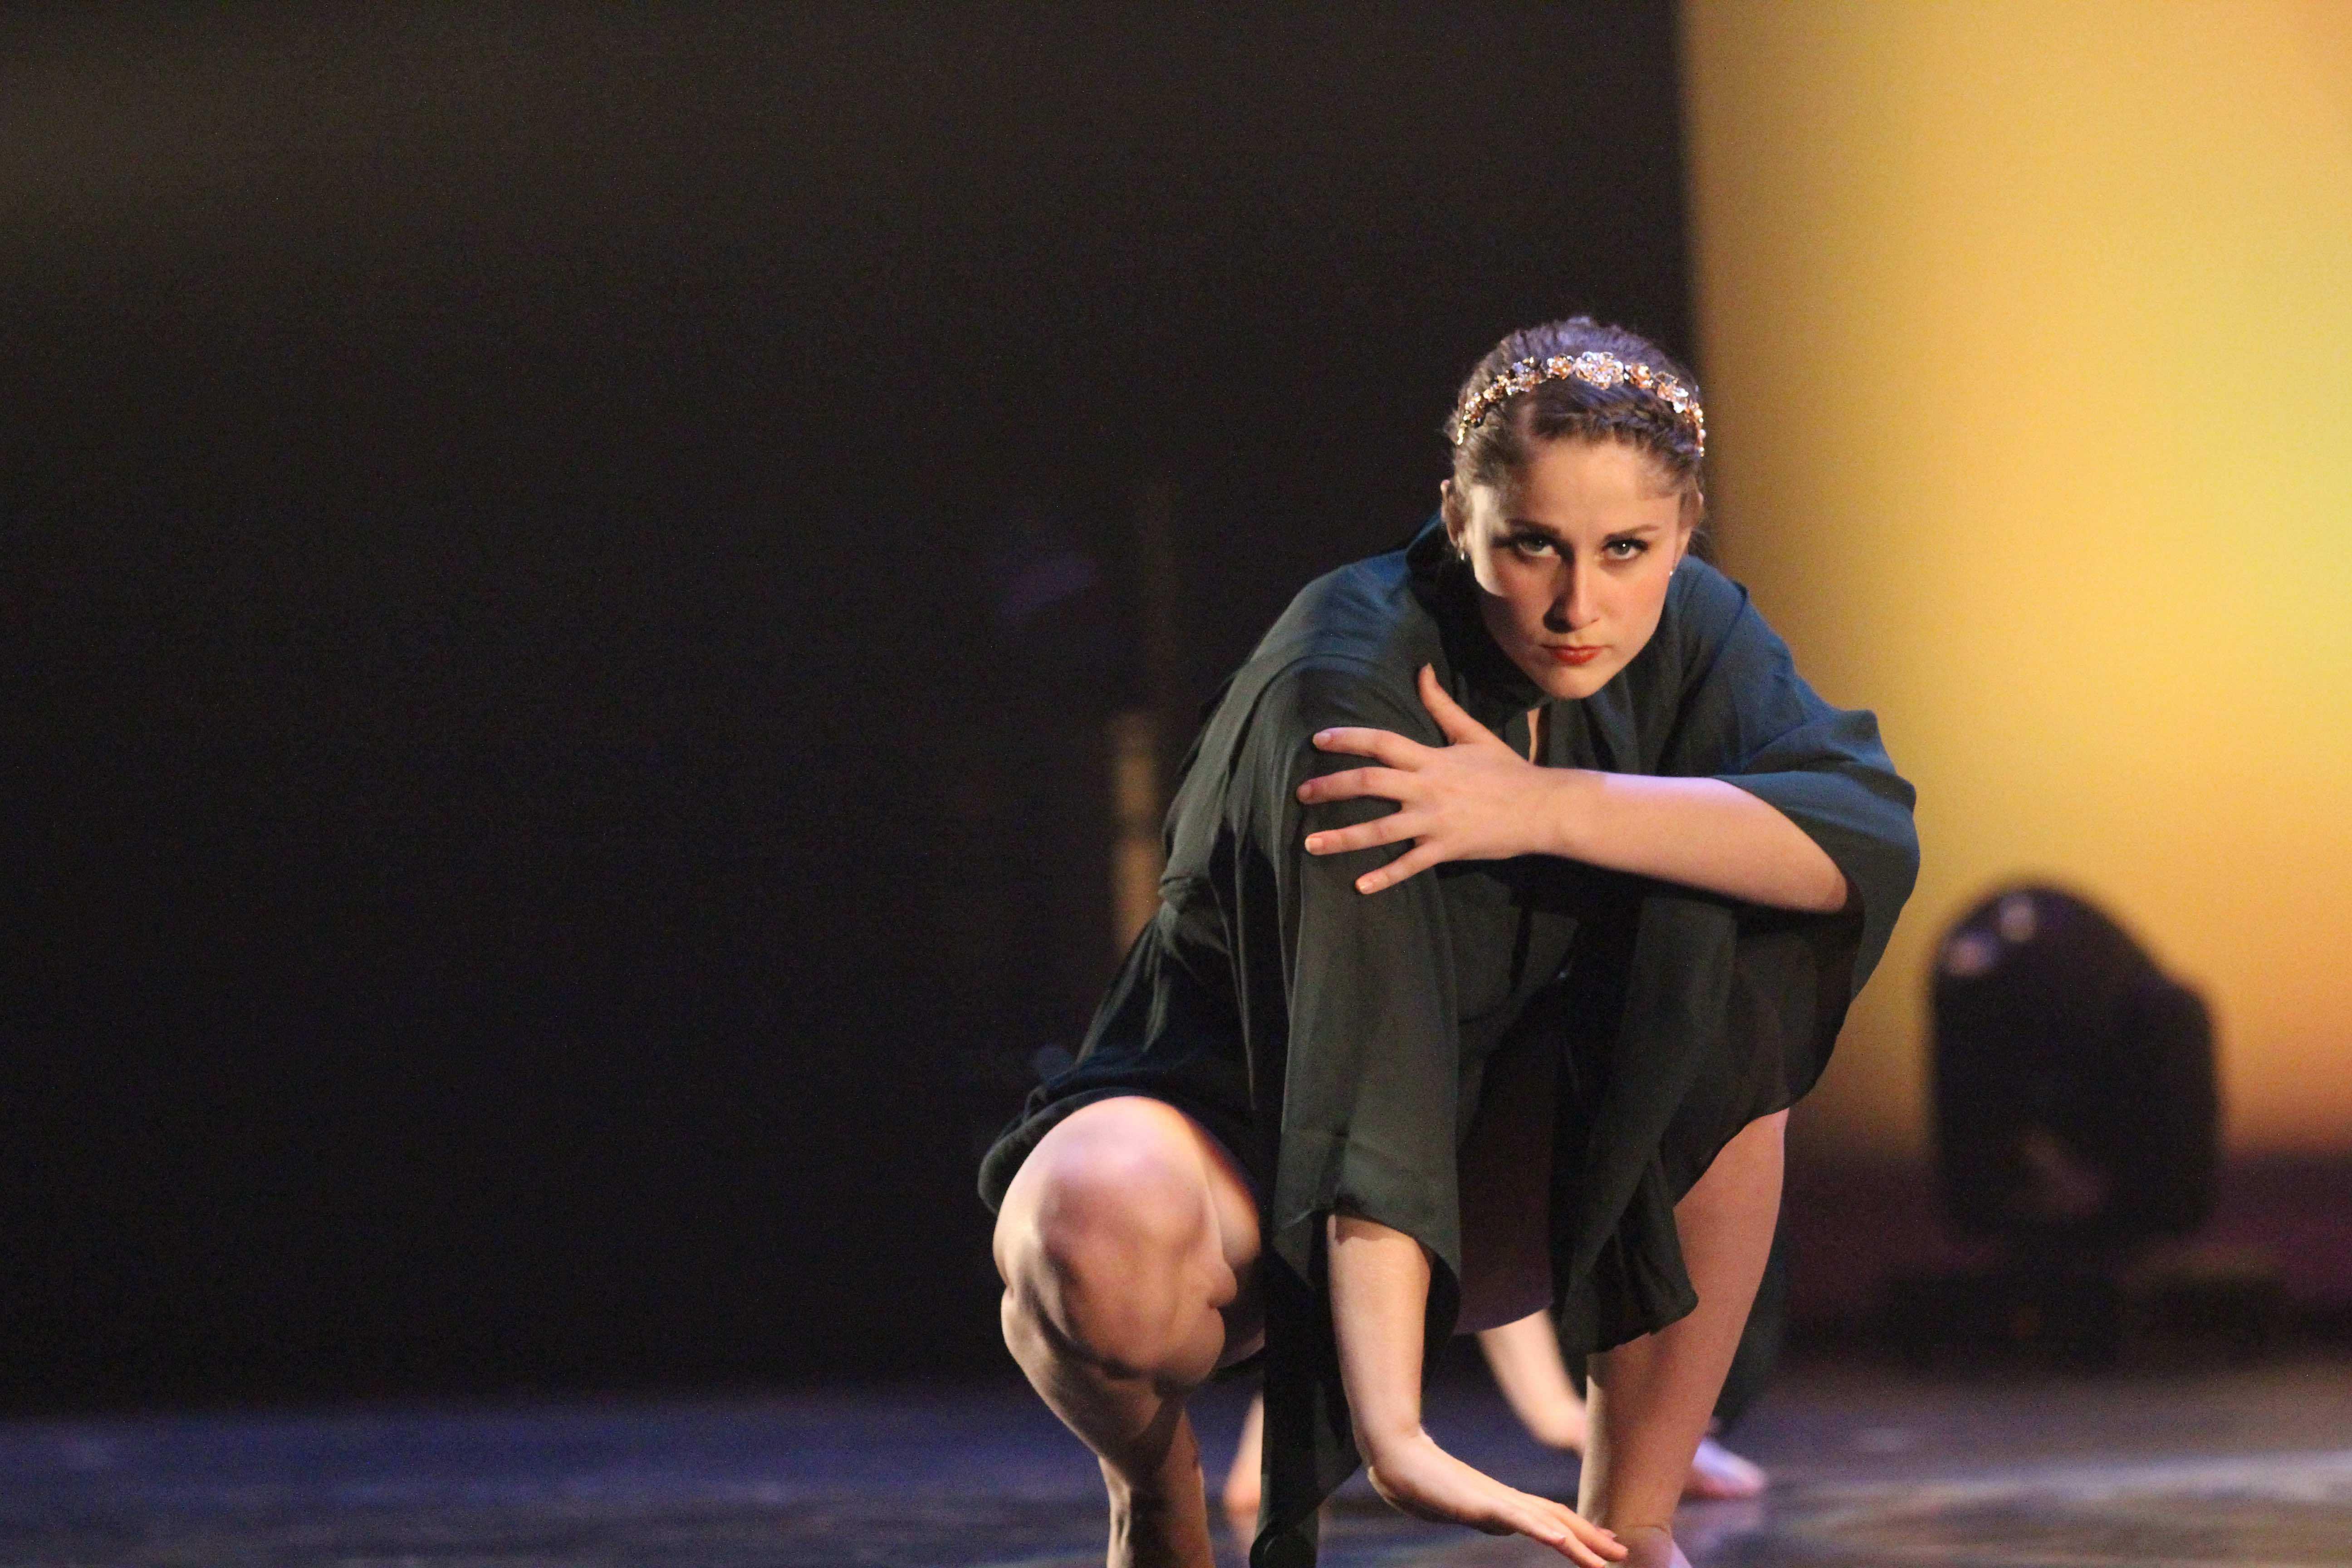 Abby+Scott+%2717+performs+her+dance+piece.